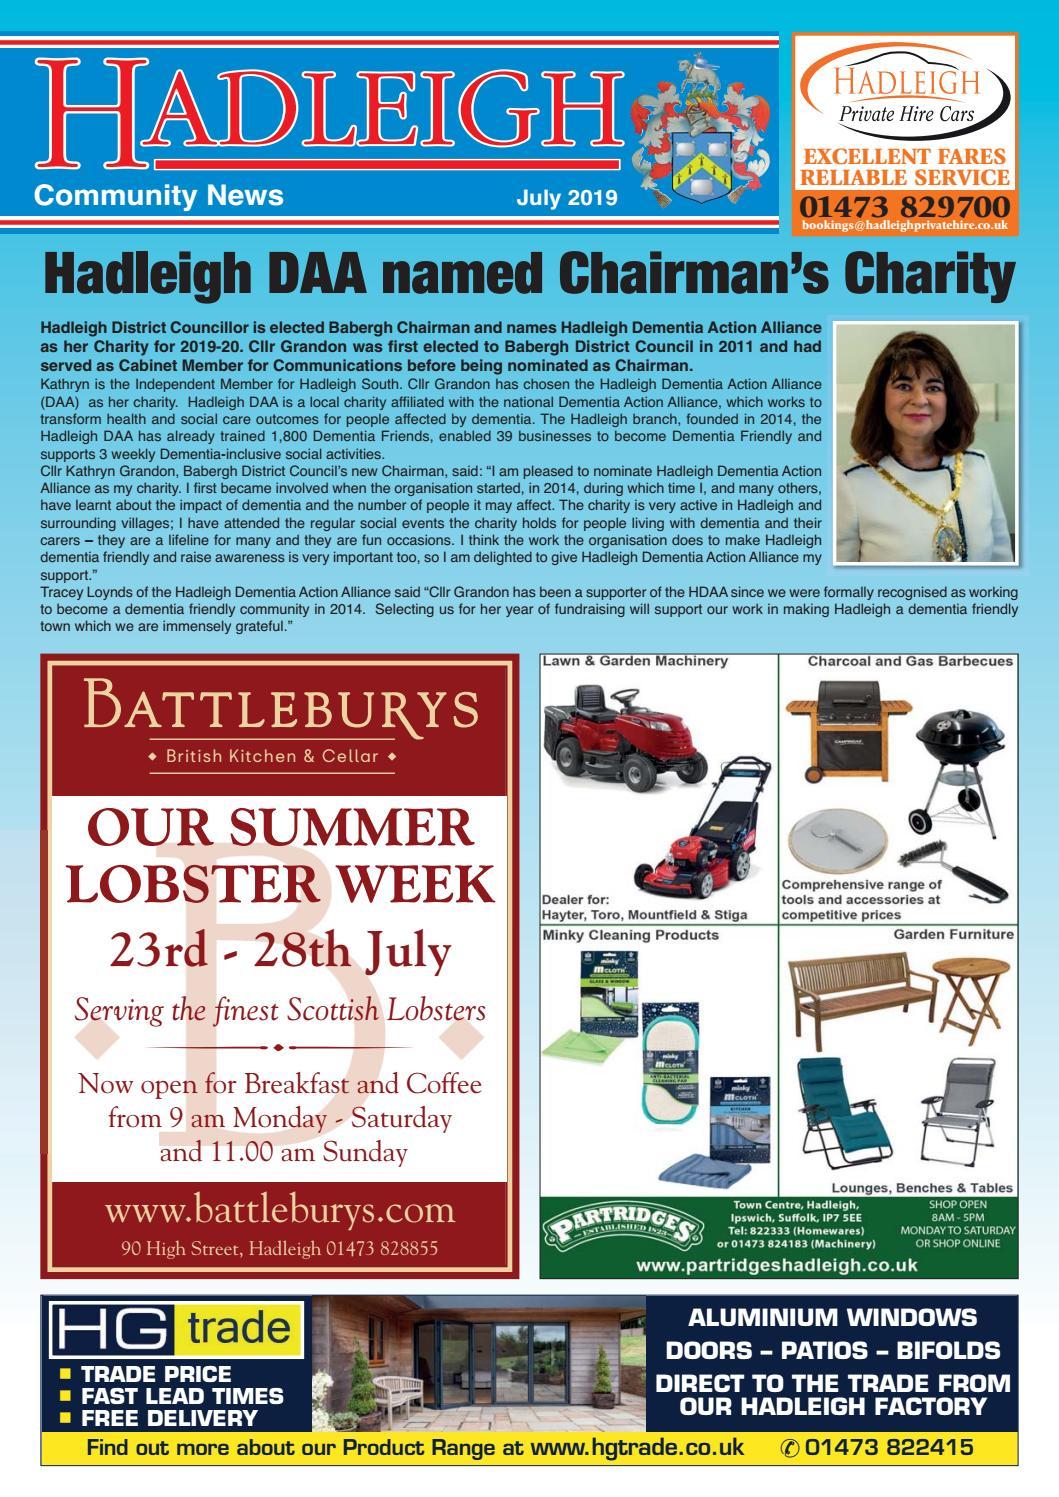 Hadleigh Community News, July 2019 by Keith Avis Printers